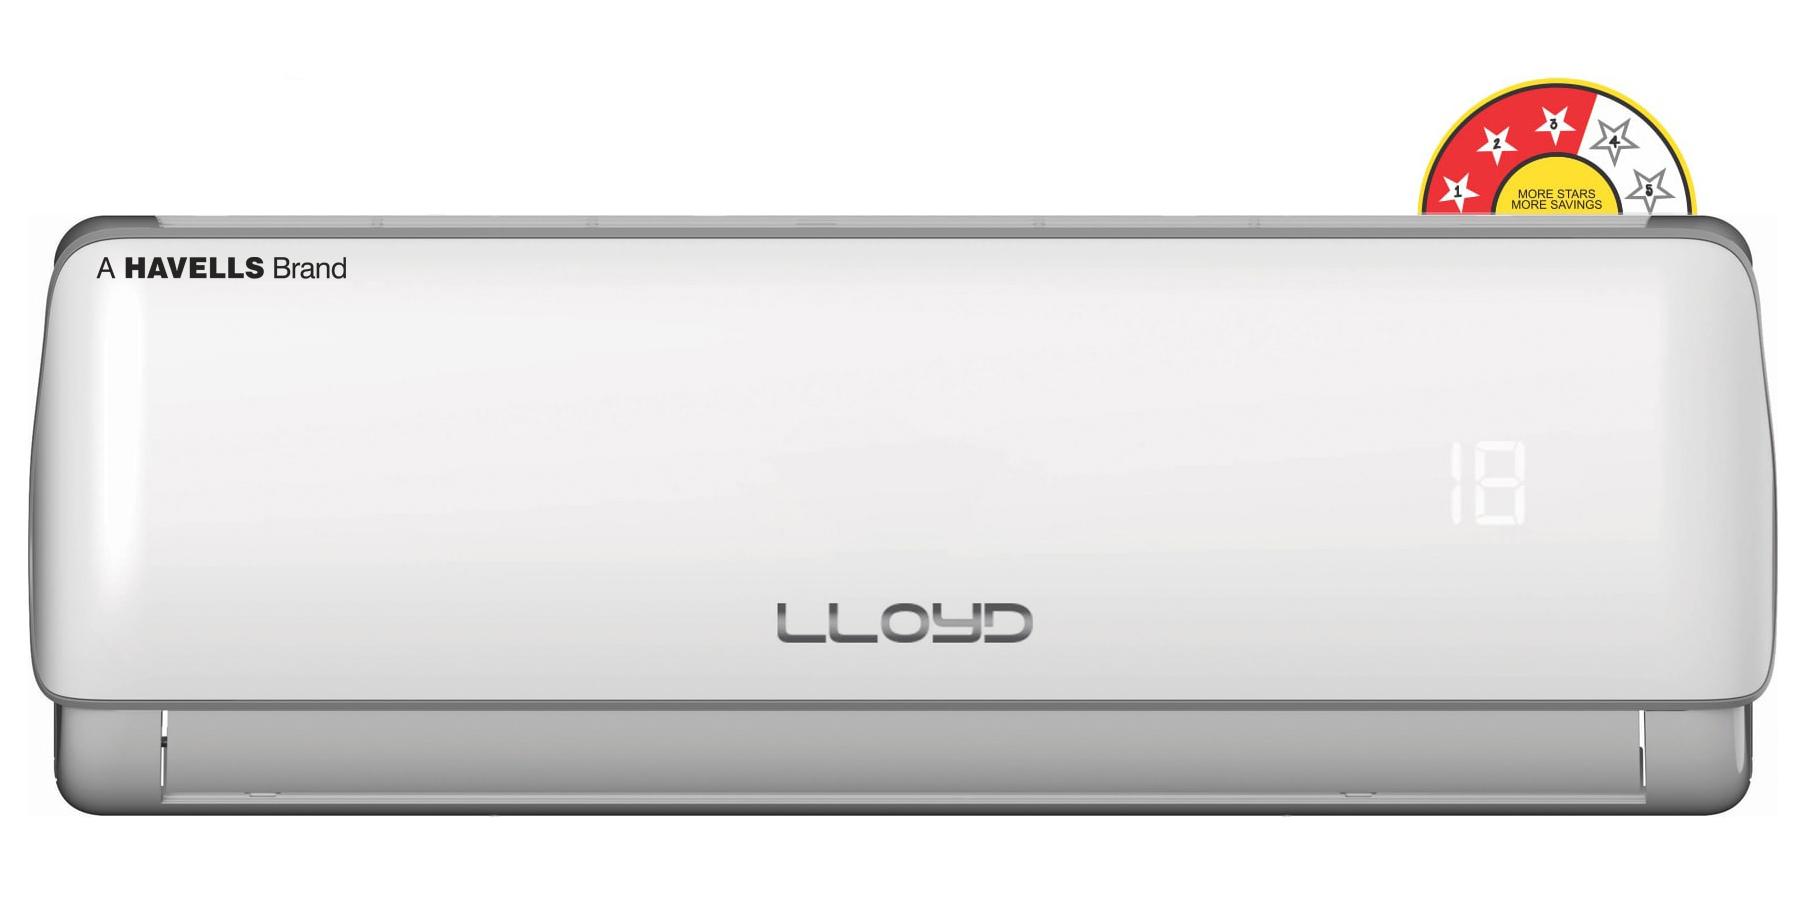 Buy Lloyd 1.5 Ton Split Air Conditioner Online - LS19B32FM